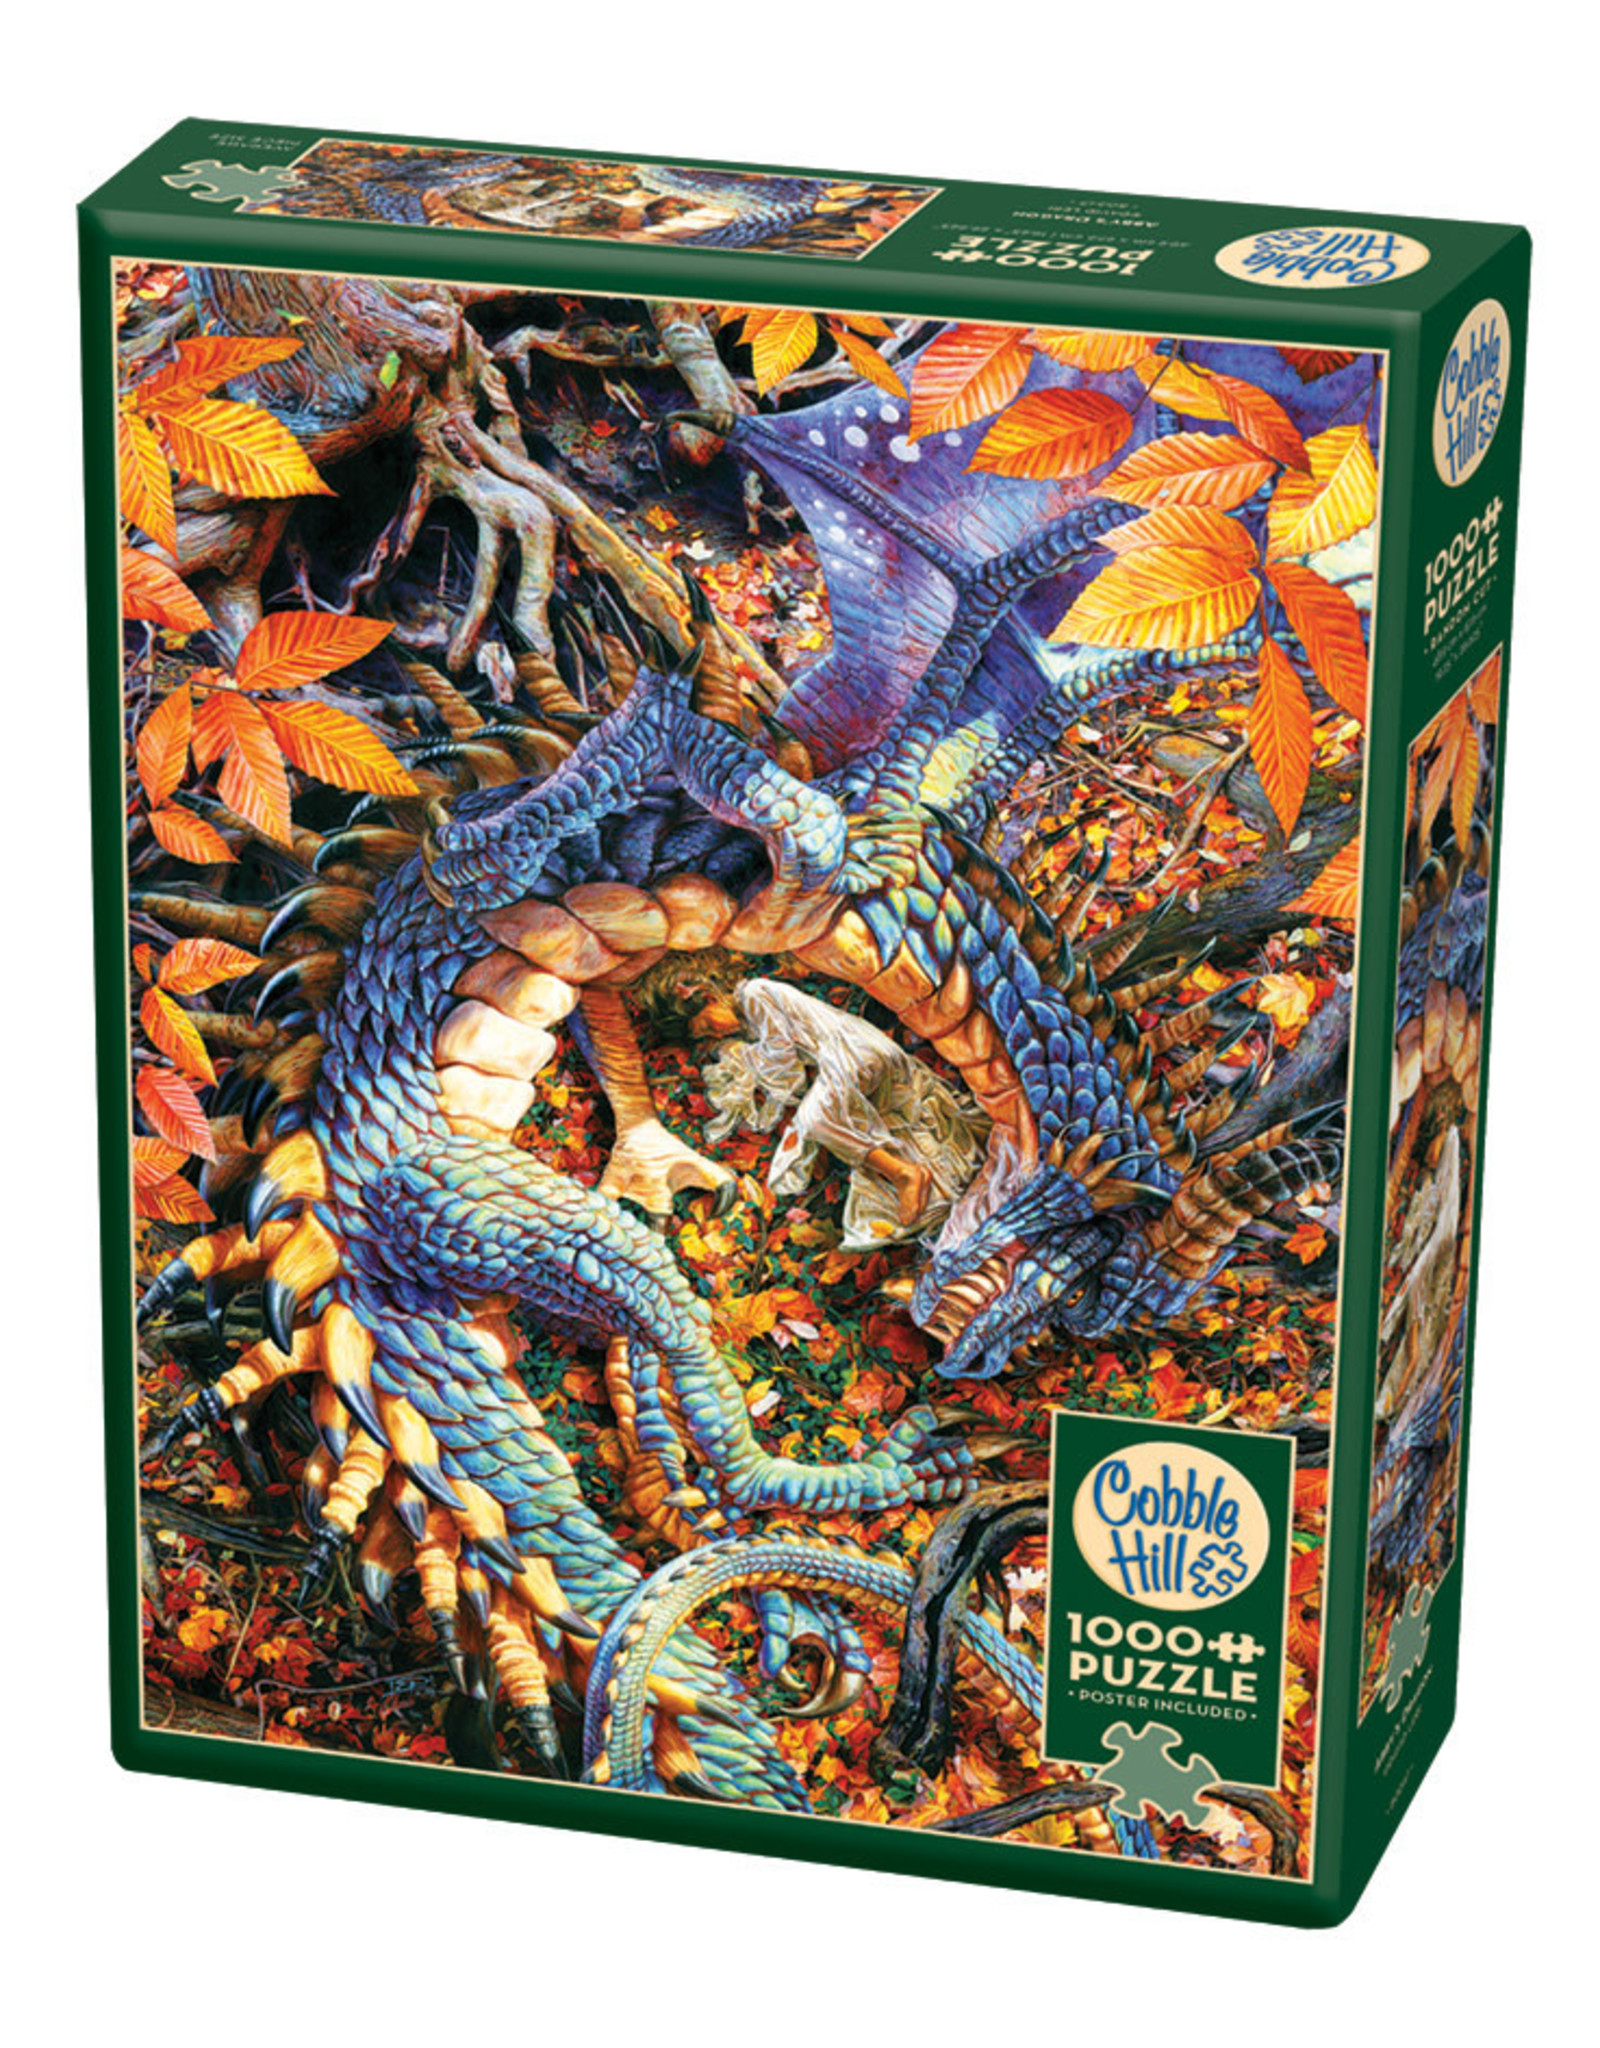 Cobble Hill Abby's Dragon 1000 pc